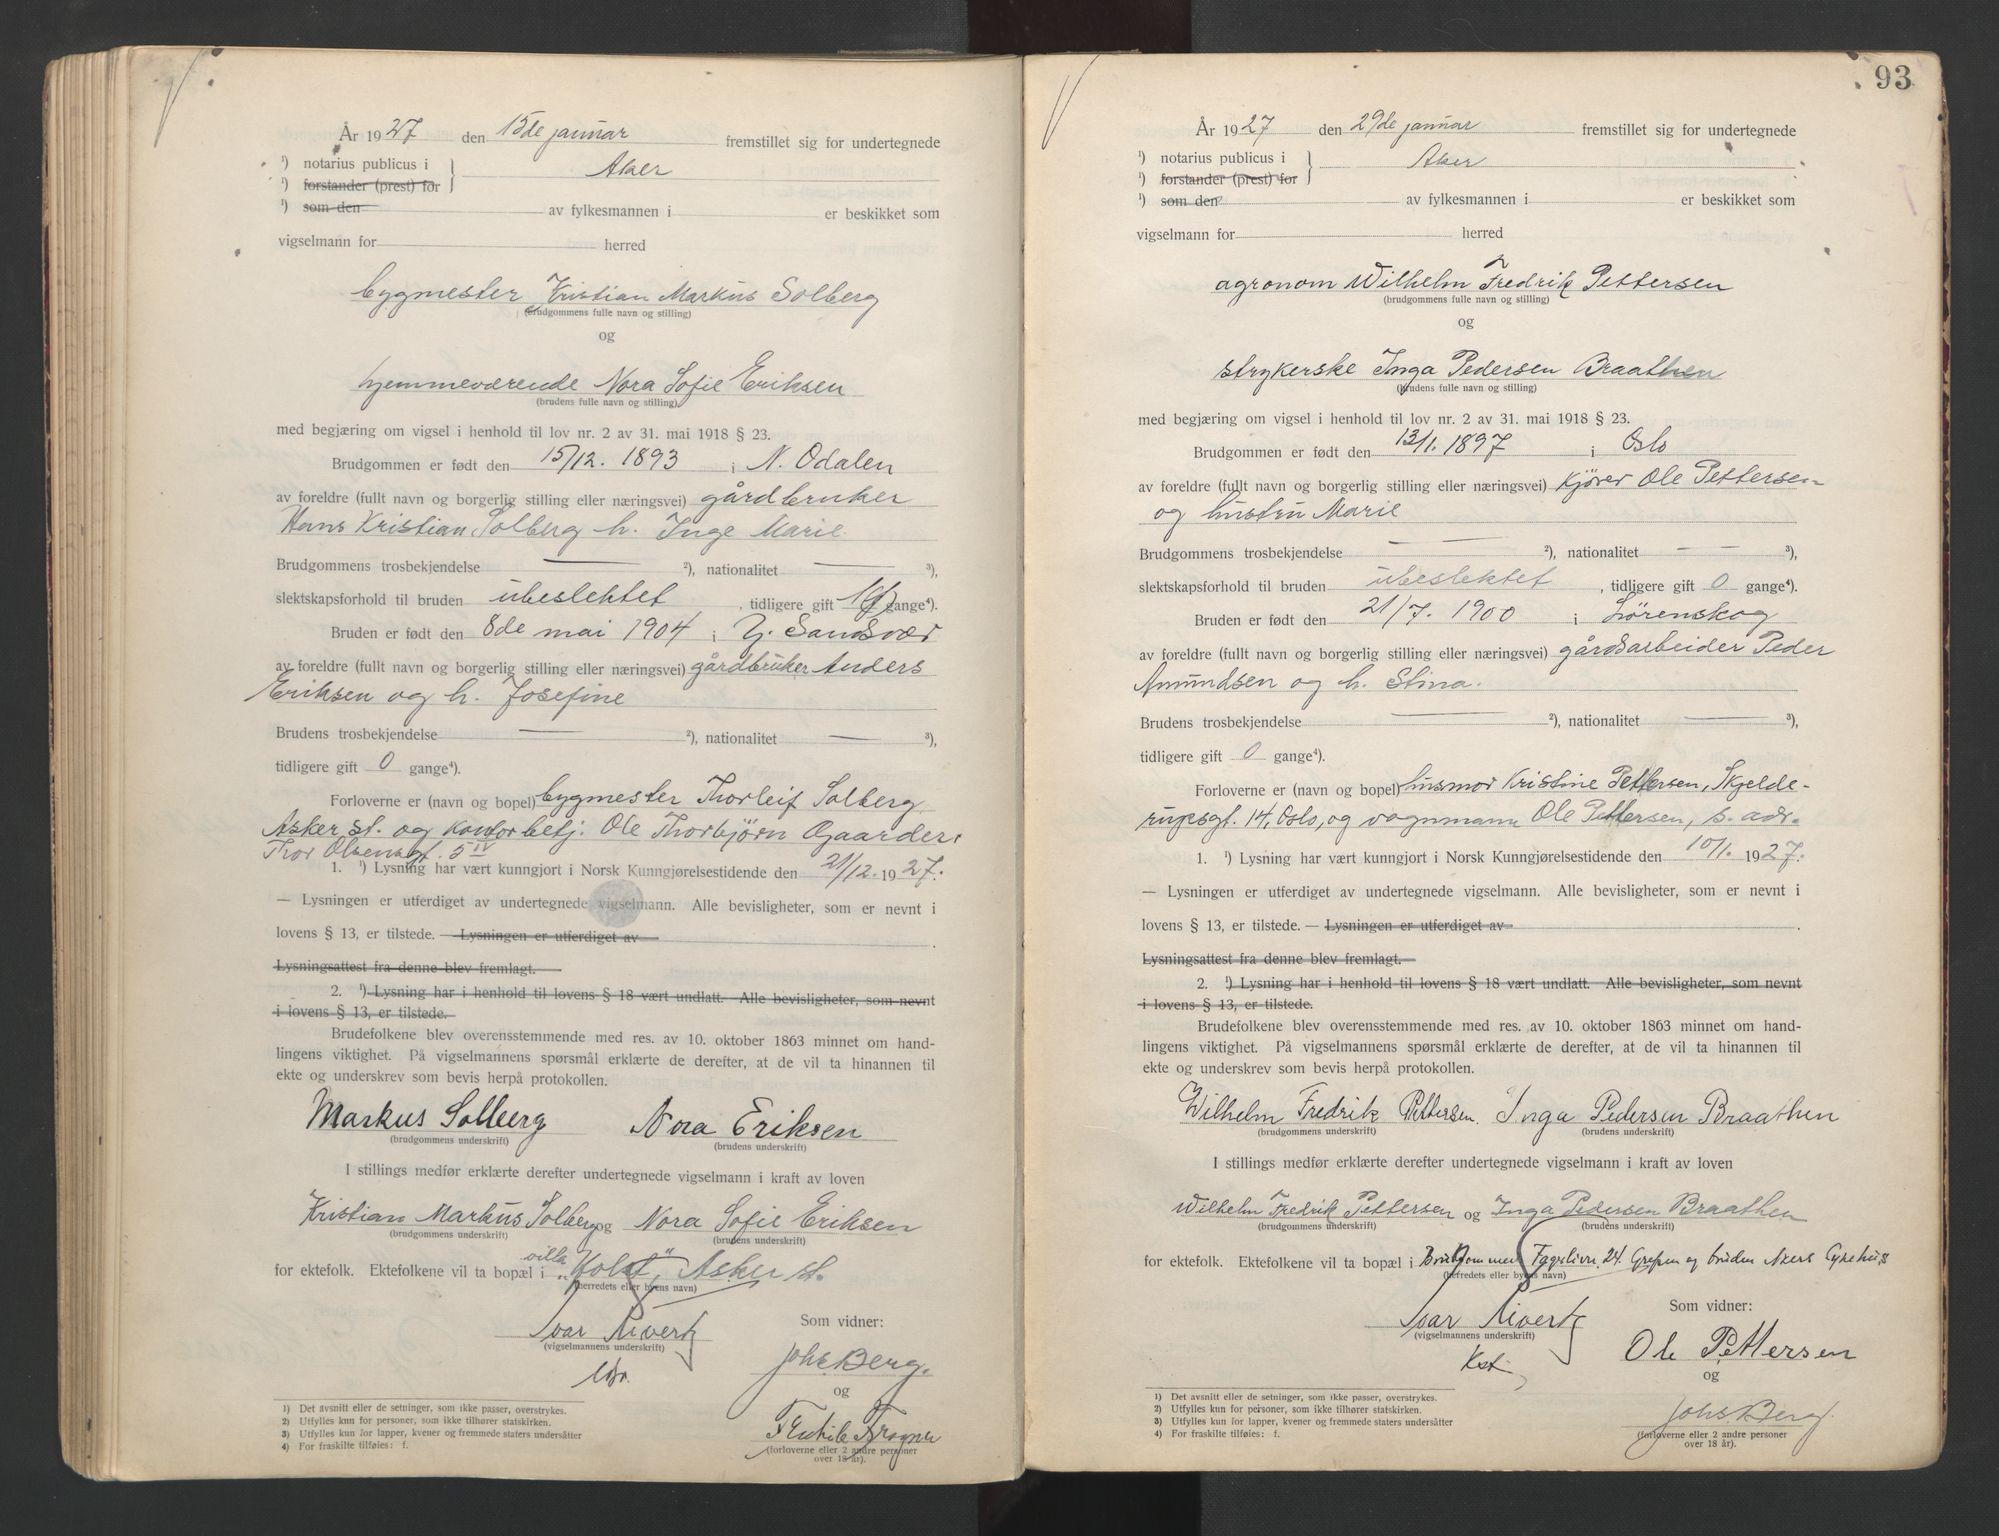 SAO, Aker sorenskriveri, L/Lc/Lcb/L0003: Vigselprotokoll, 1924-1927, s. 93